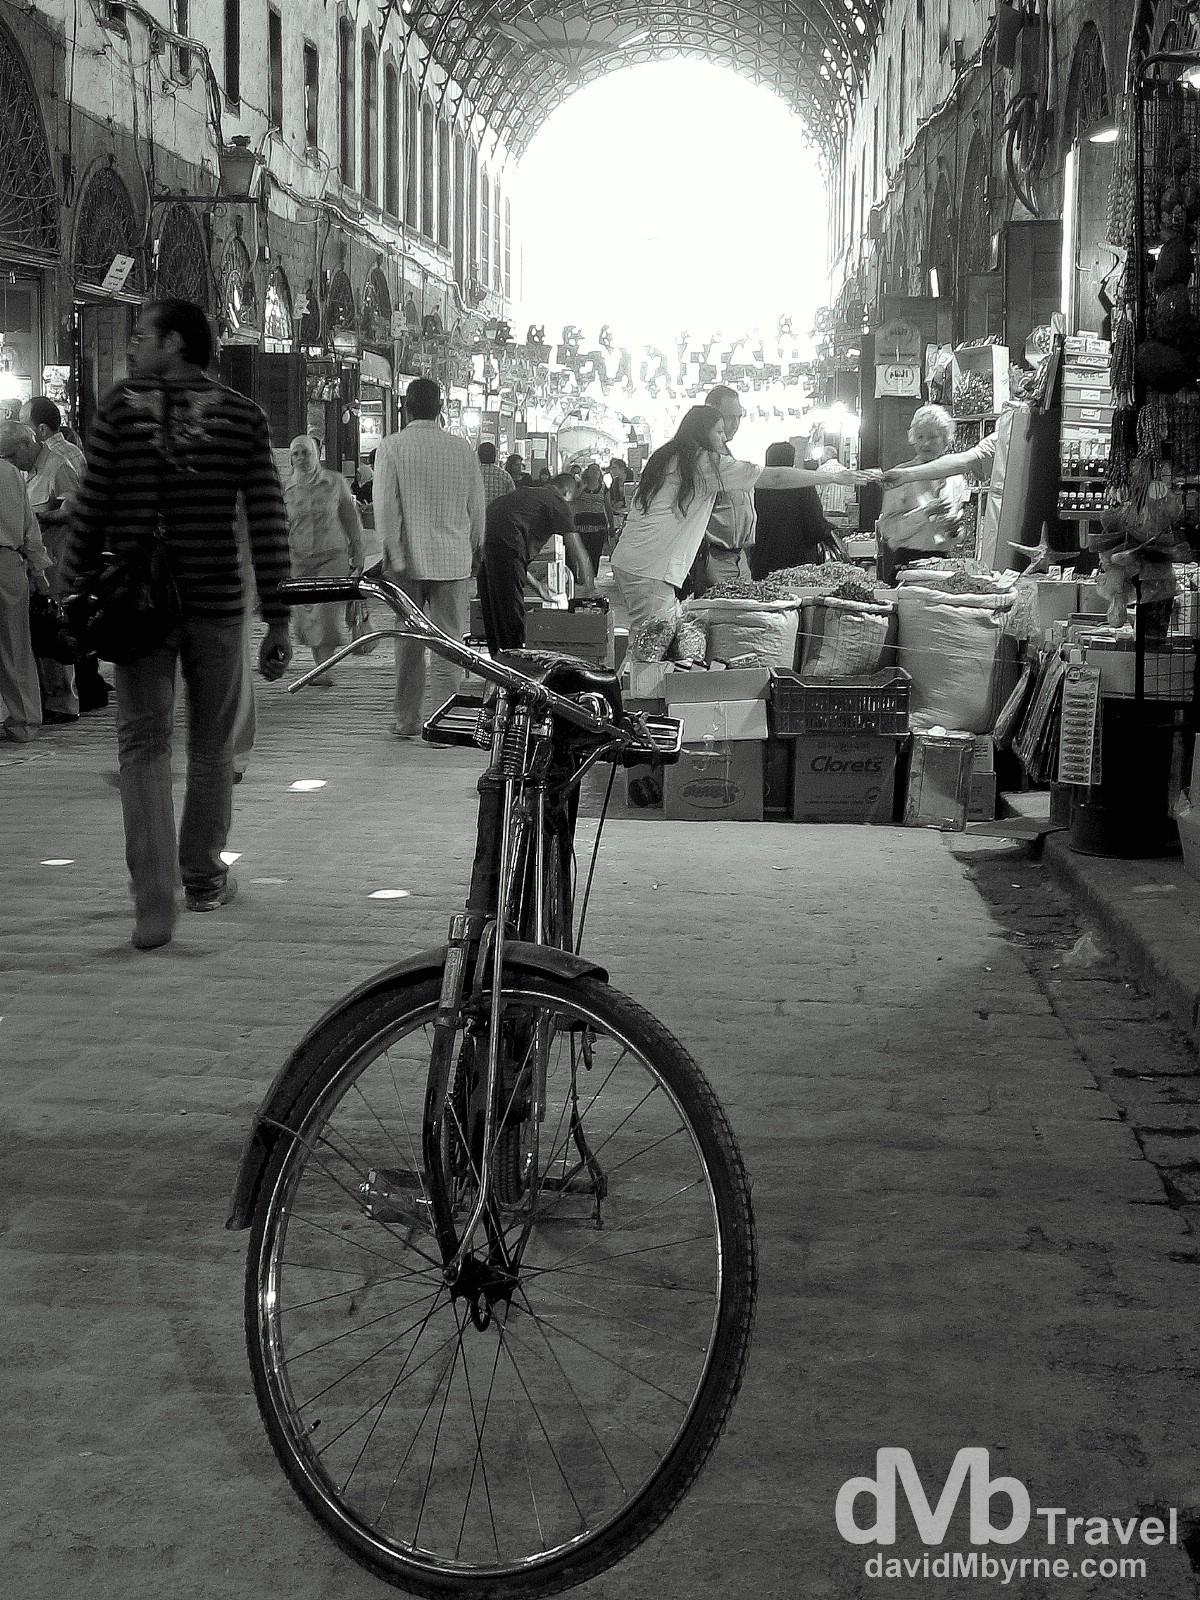 Al-Hamidiyah Souq, Damascus, Syria. May 4, 2008.